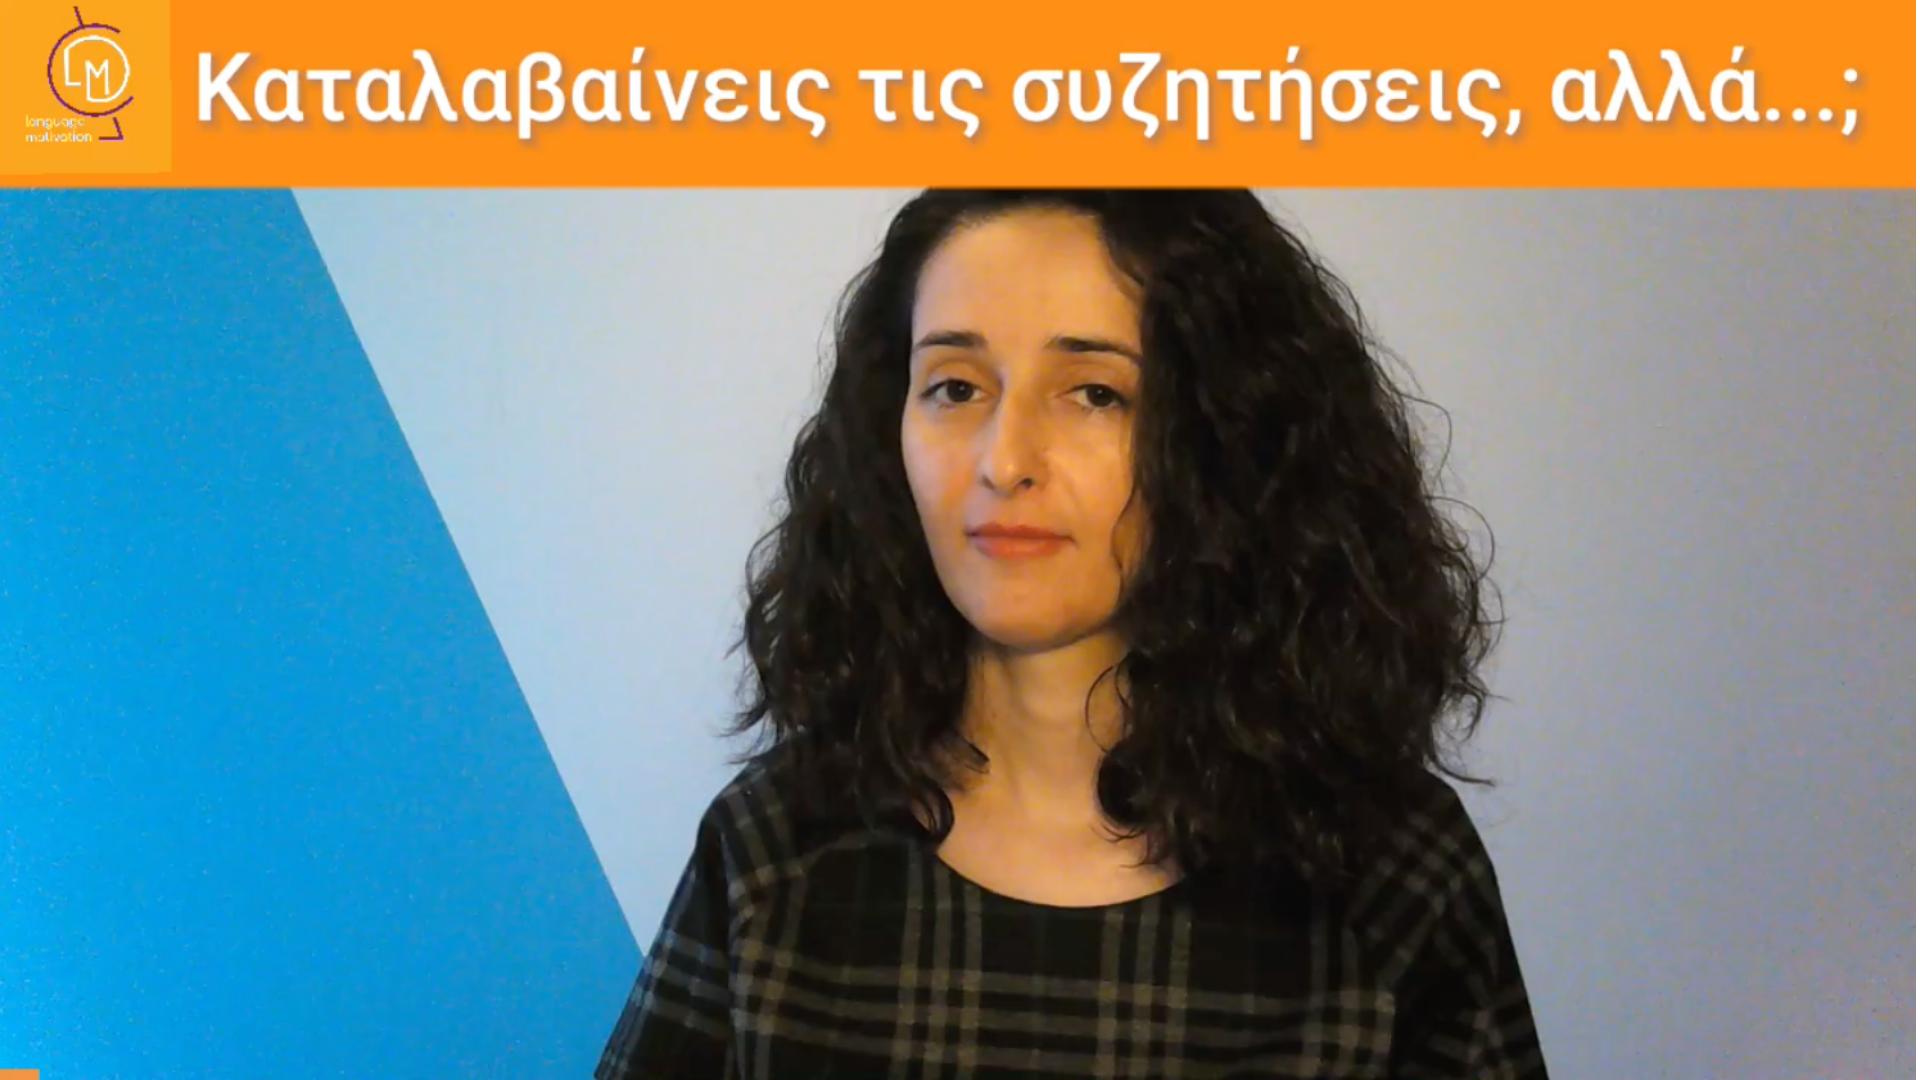 Video: I understand the conversations, but… , 🇬🇧 & 🇬🇷 transcript